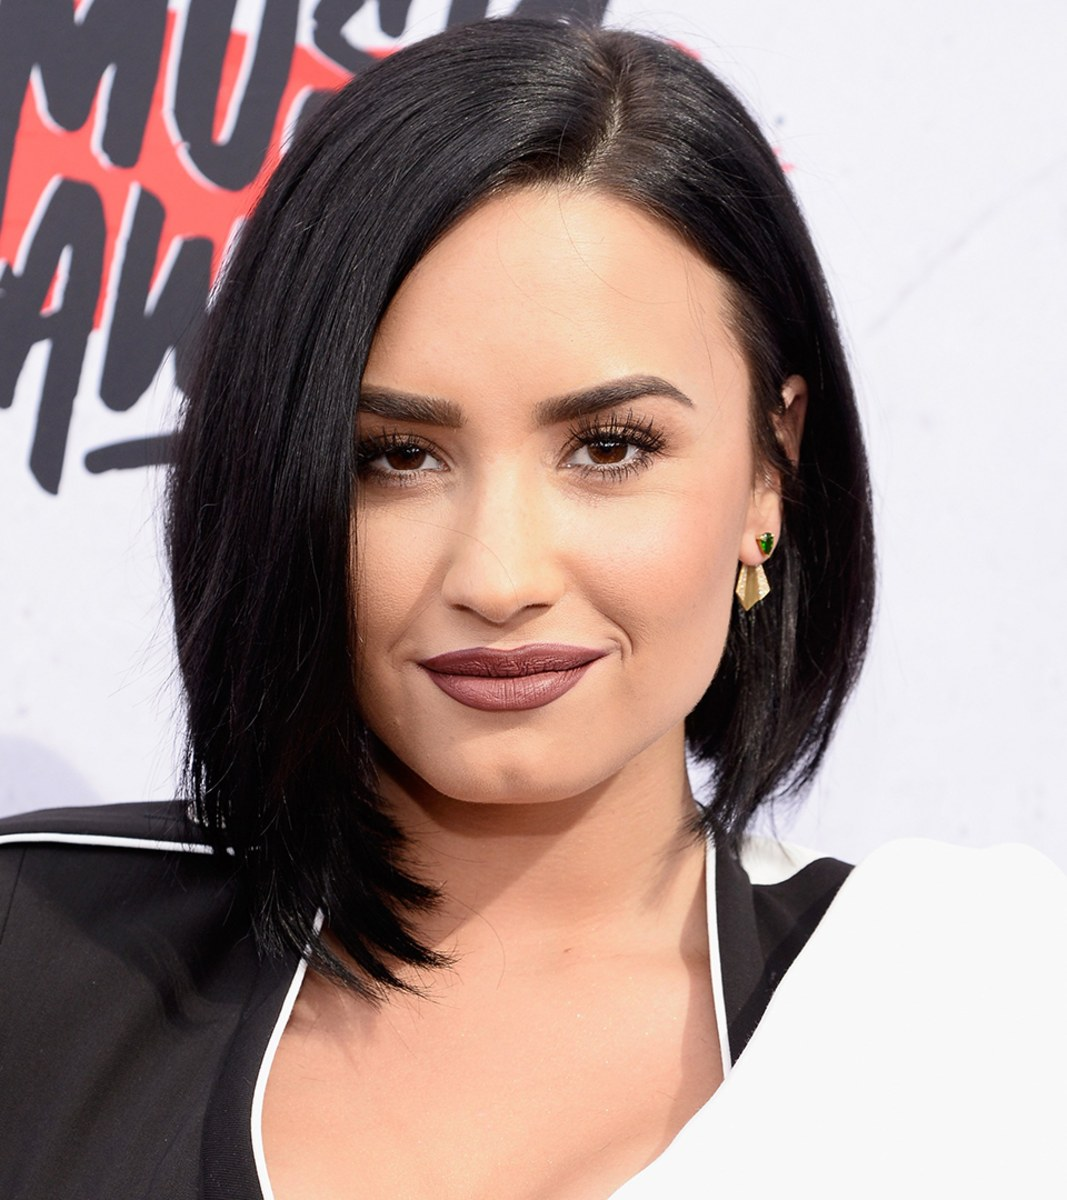 Short hairstyles for 2016: Celebrity-inspired modern